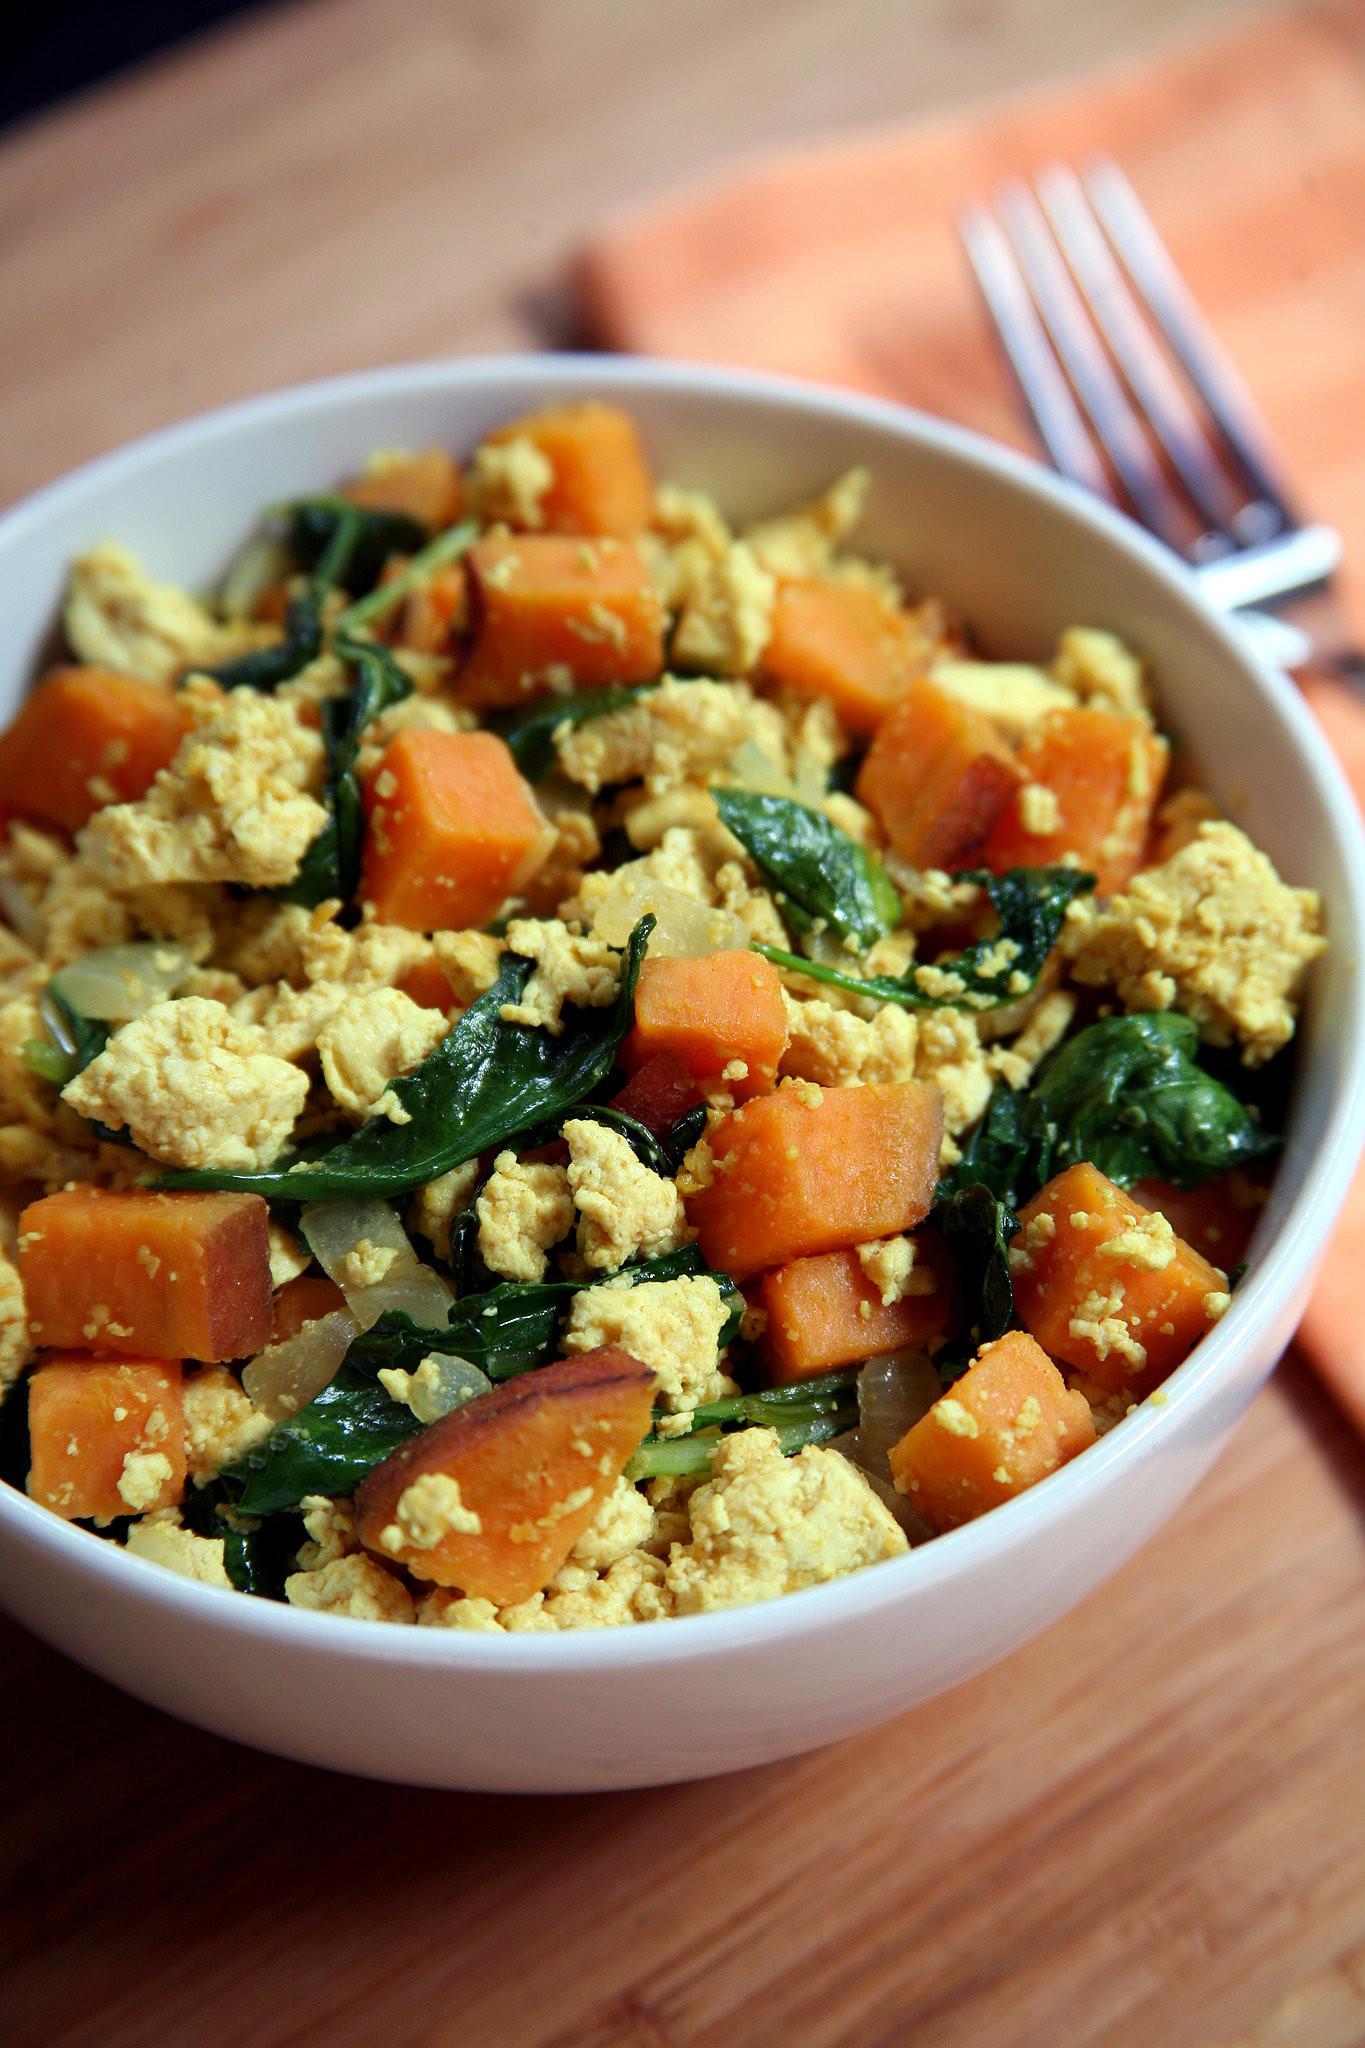 Best Vegan Breakfast Recipes  Vegan Breakfast Recipes Tofu Kale Sweet Potato Scramble